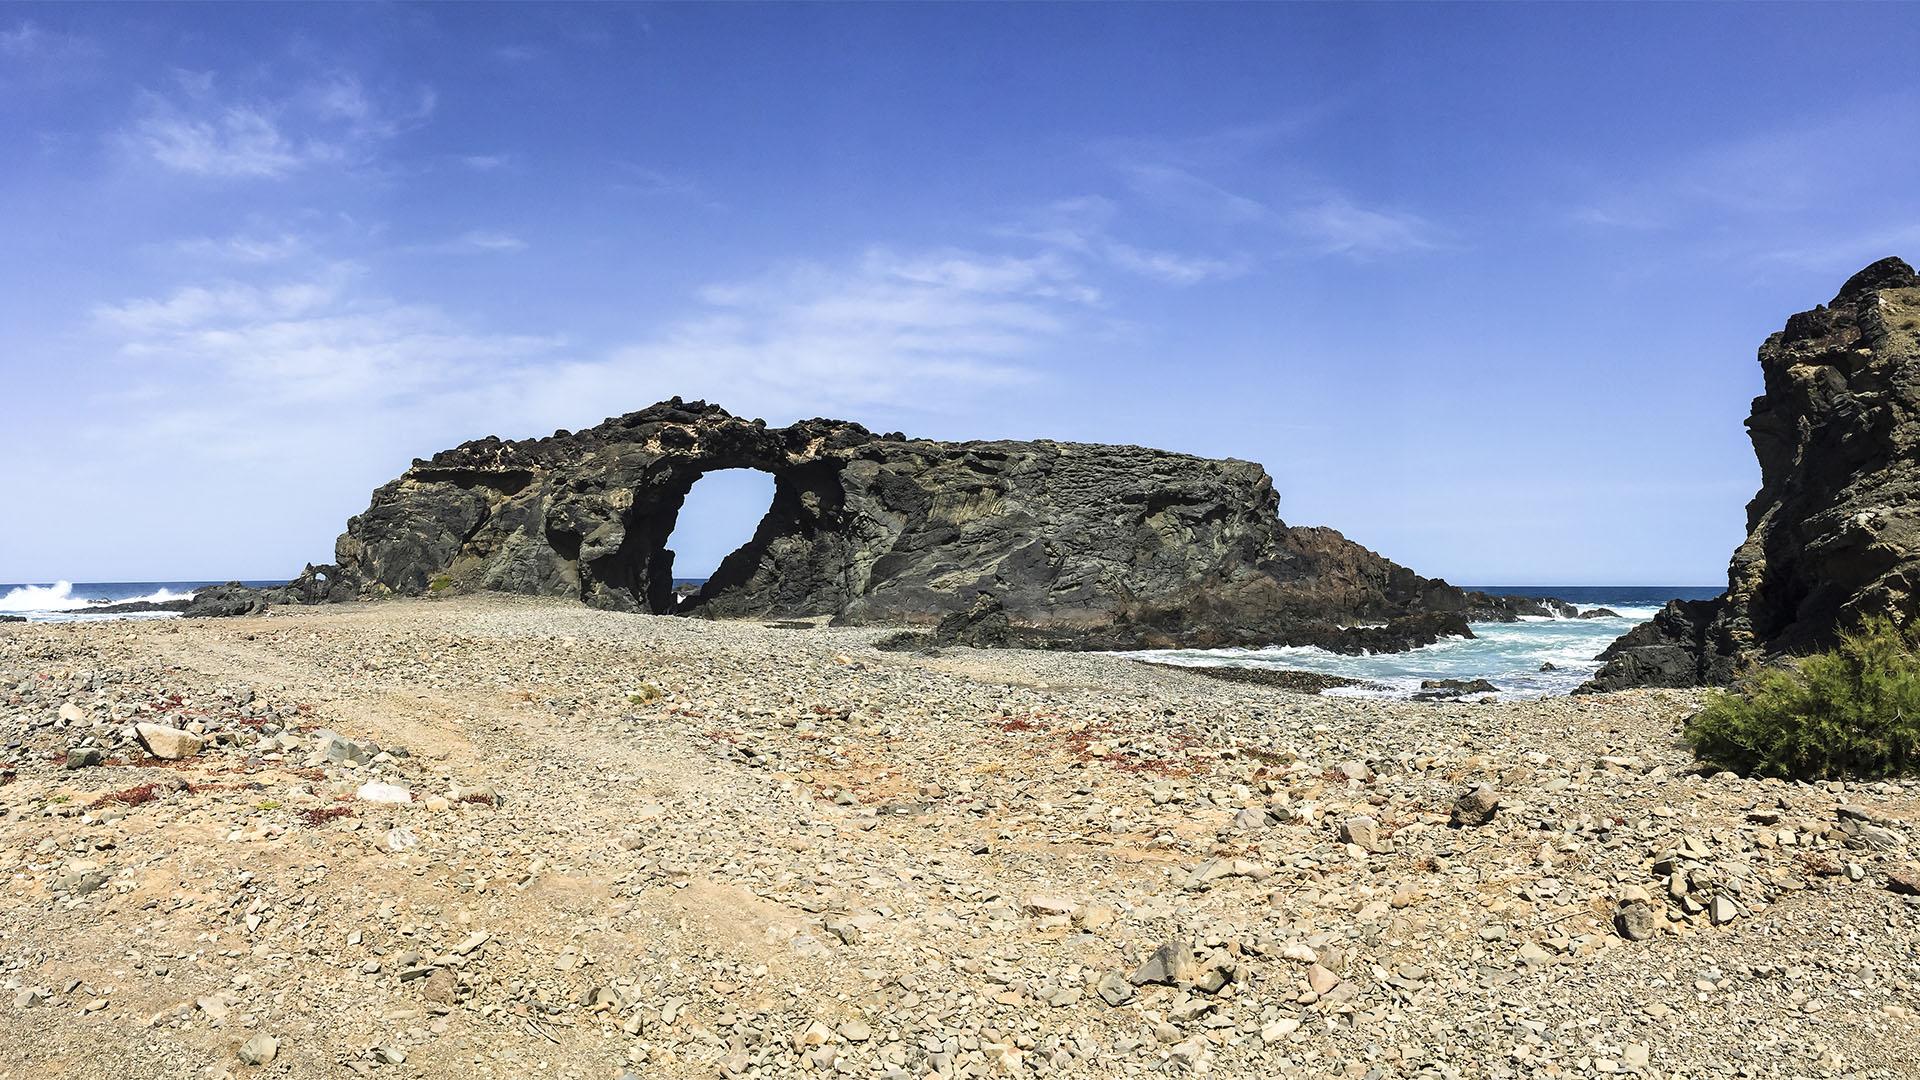 Das Felsentor Arco de Jurado – hier ging Gadifer de La Salle und seine Mannschaft im November 1404 an Land.